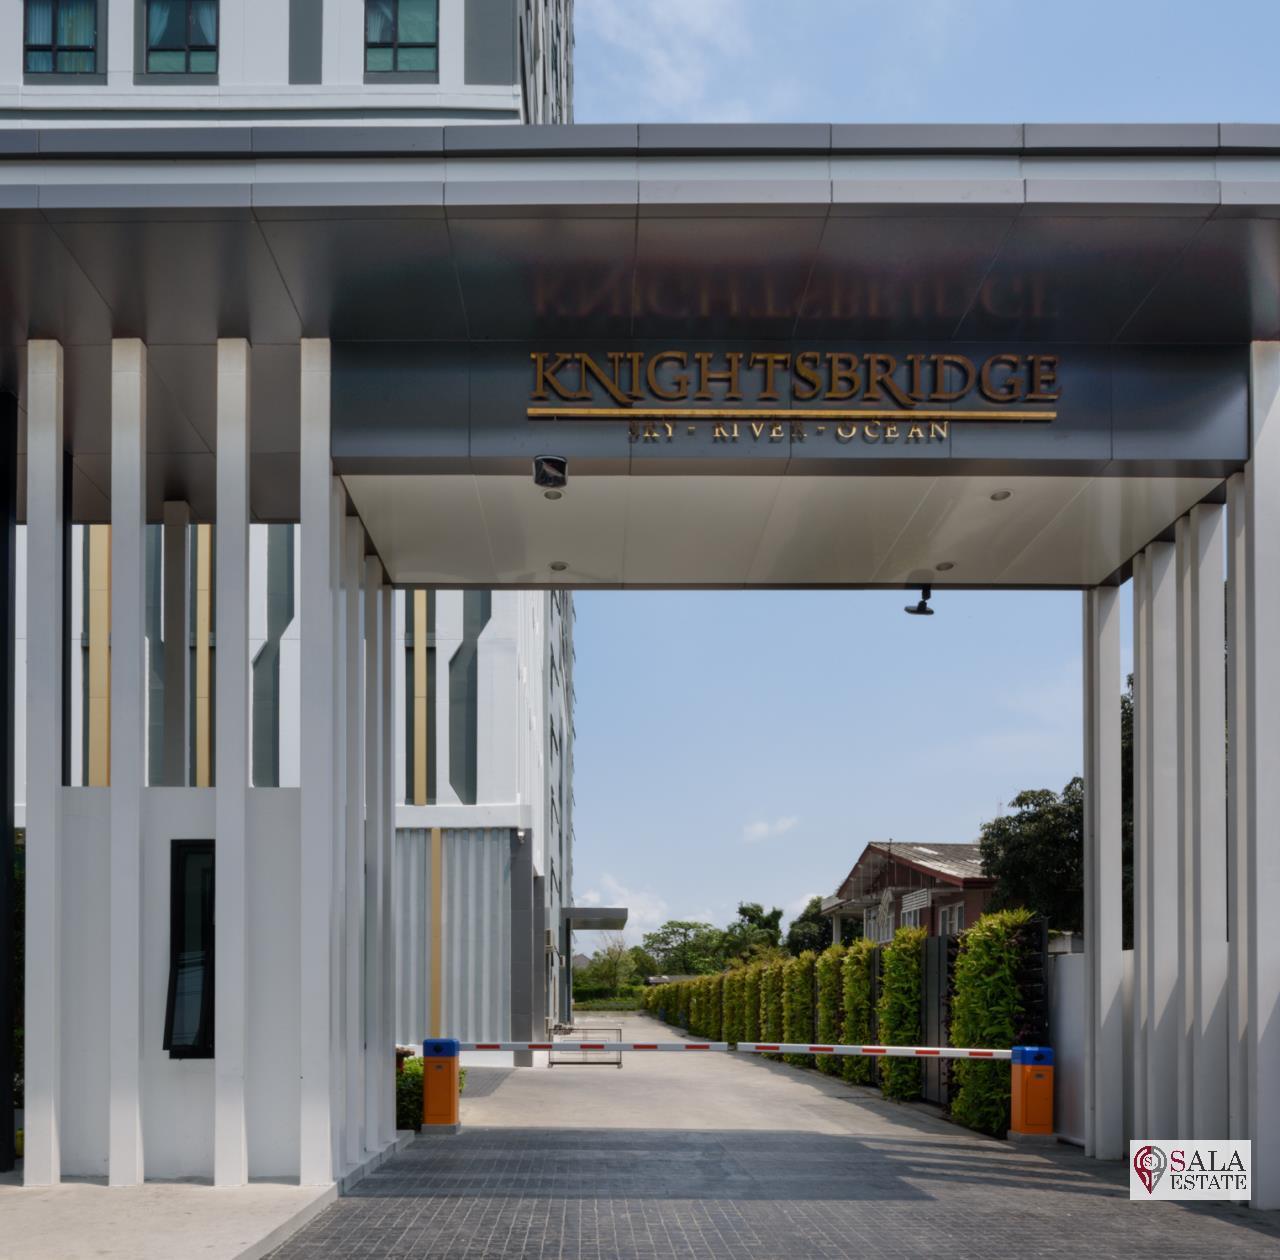 SALA ESTATE Agency's ( FOR SALE ) KNIGHTSBRIDGE SKY RIVER OCEAN – BTS PAK NAM, PENTHOUSES TYPE, RIVER VIEW 6